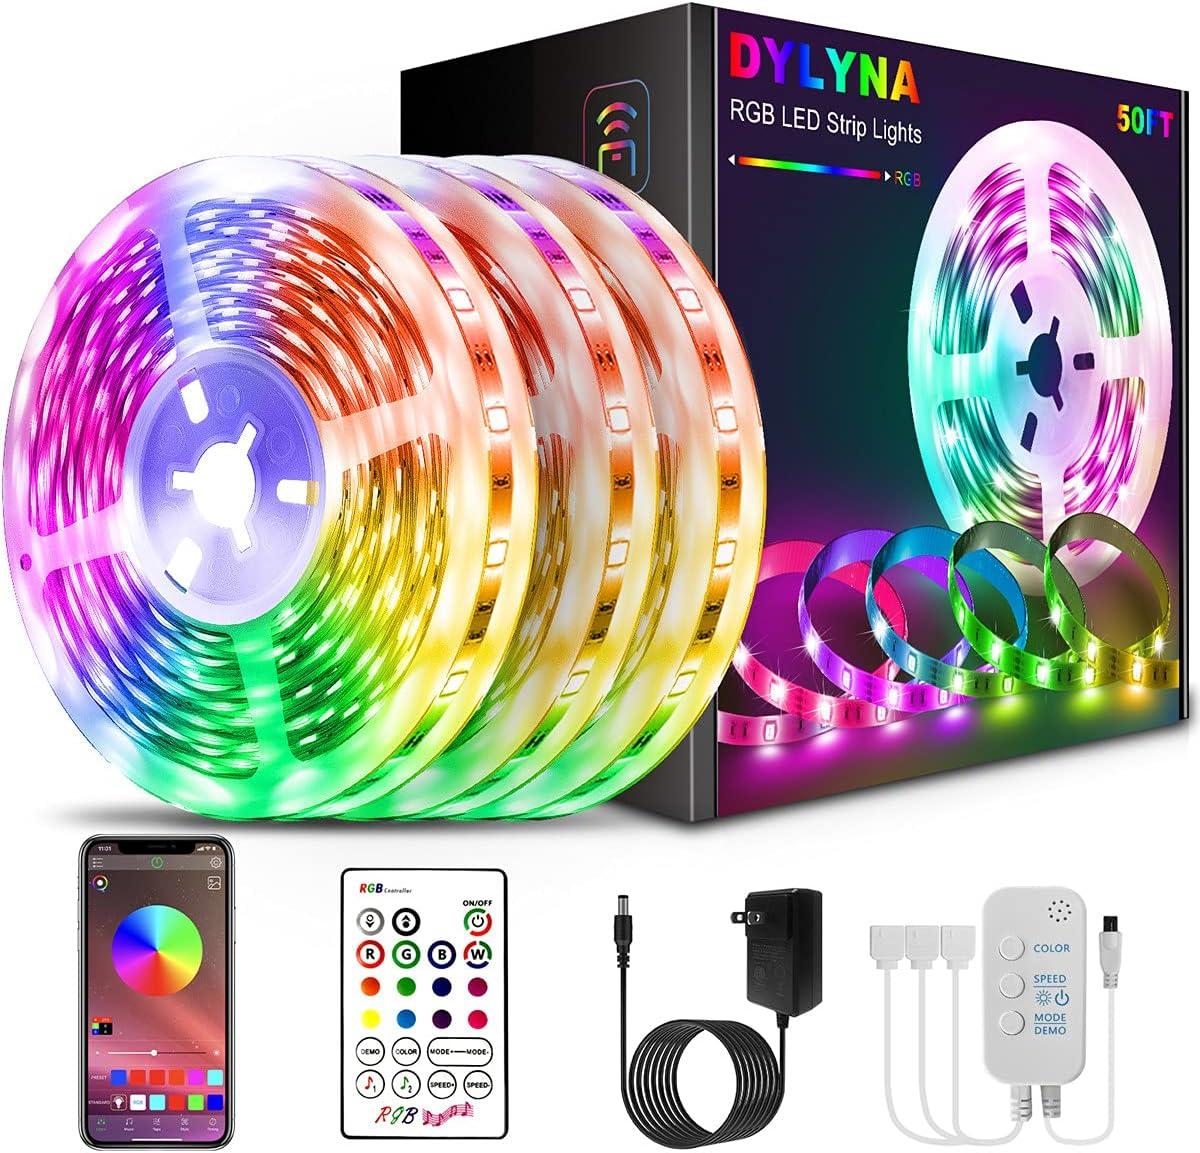 DYLYNA Led Strip Lights 50ft, Music Sync Color Change Led Lights for Bedroom,5050 SMD RGB Led Light Strips with Remote App Control Led Lights for Room Party